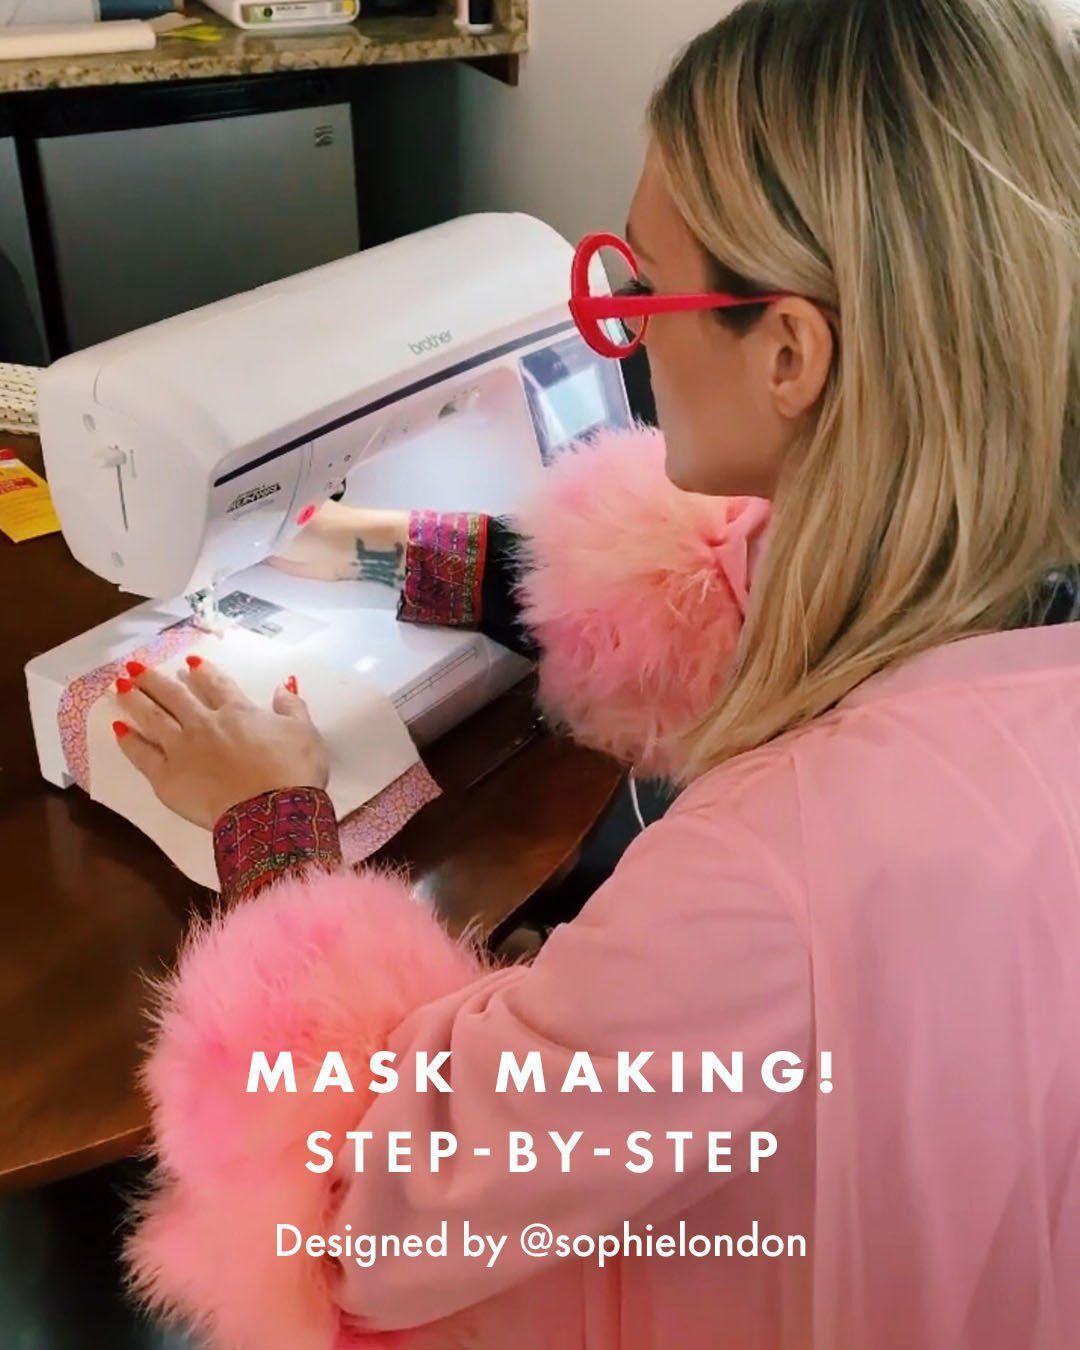 DIY Face Mask Tutorial in 2020 Face mask tutorial, Mask